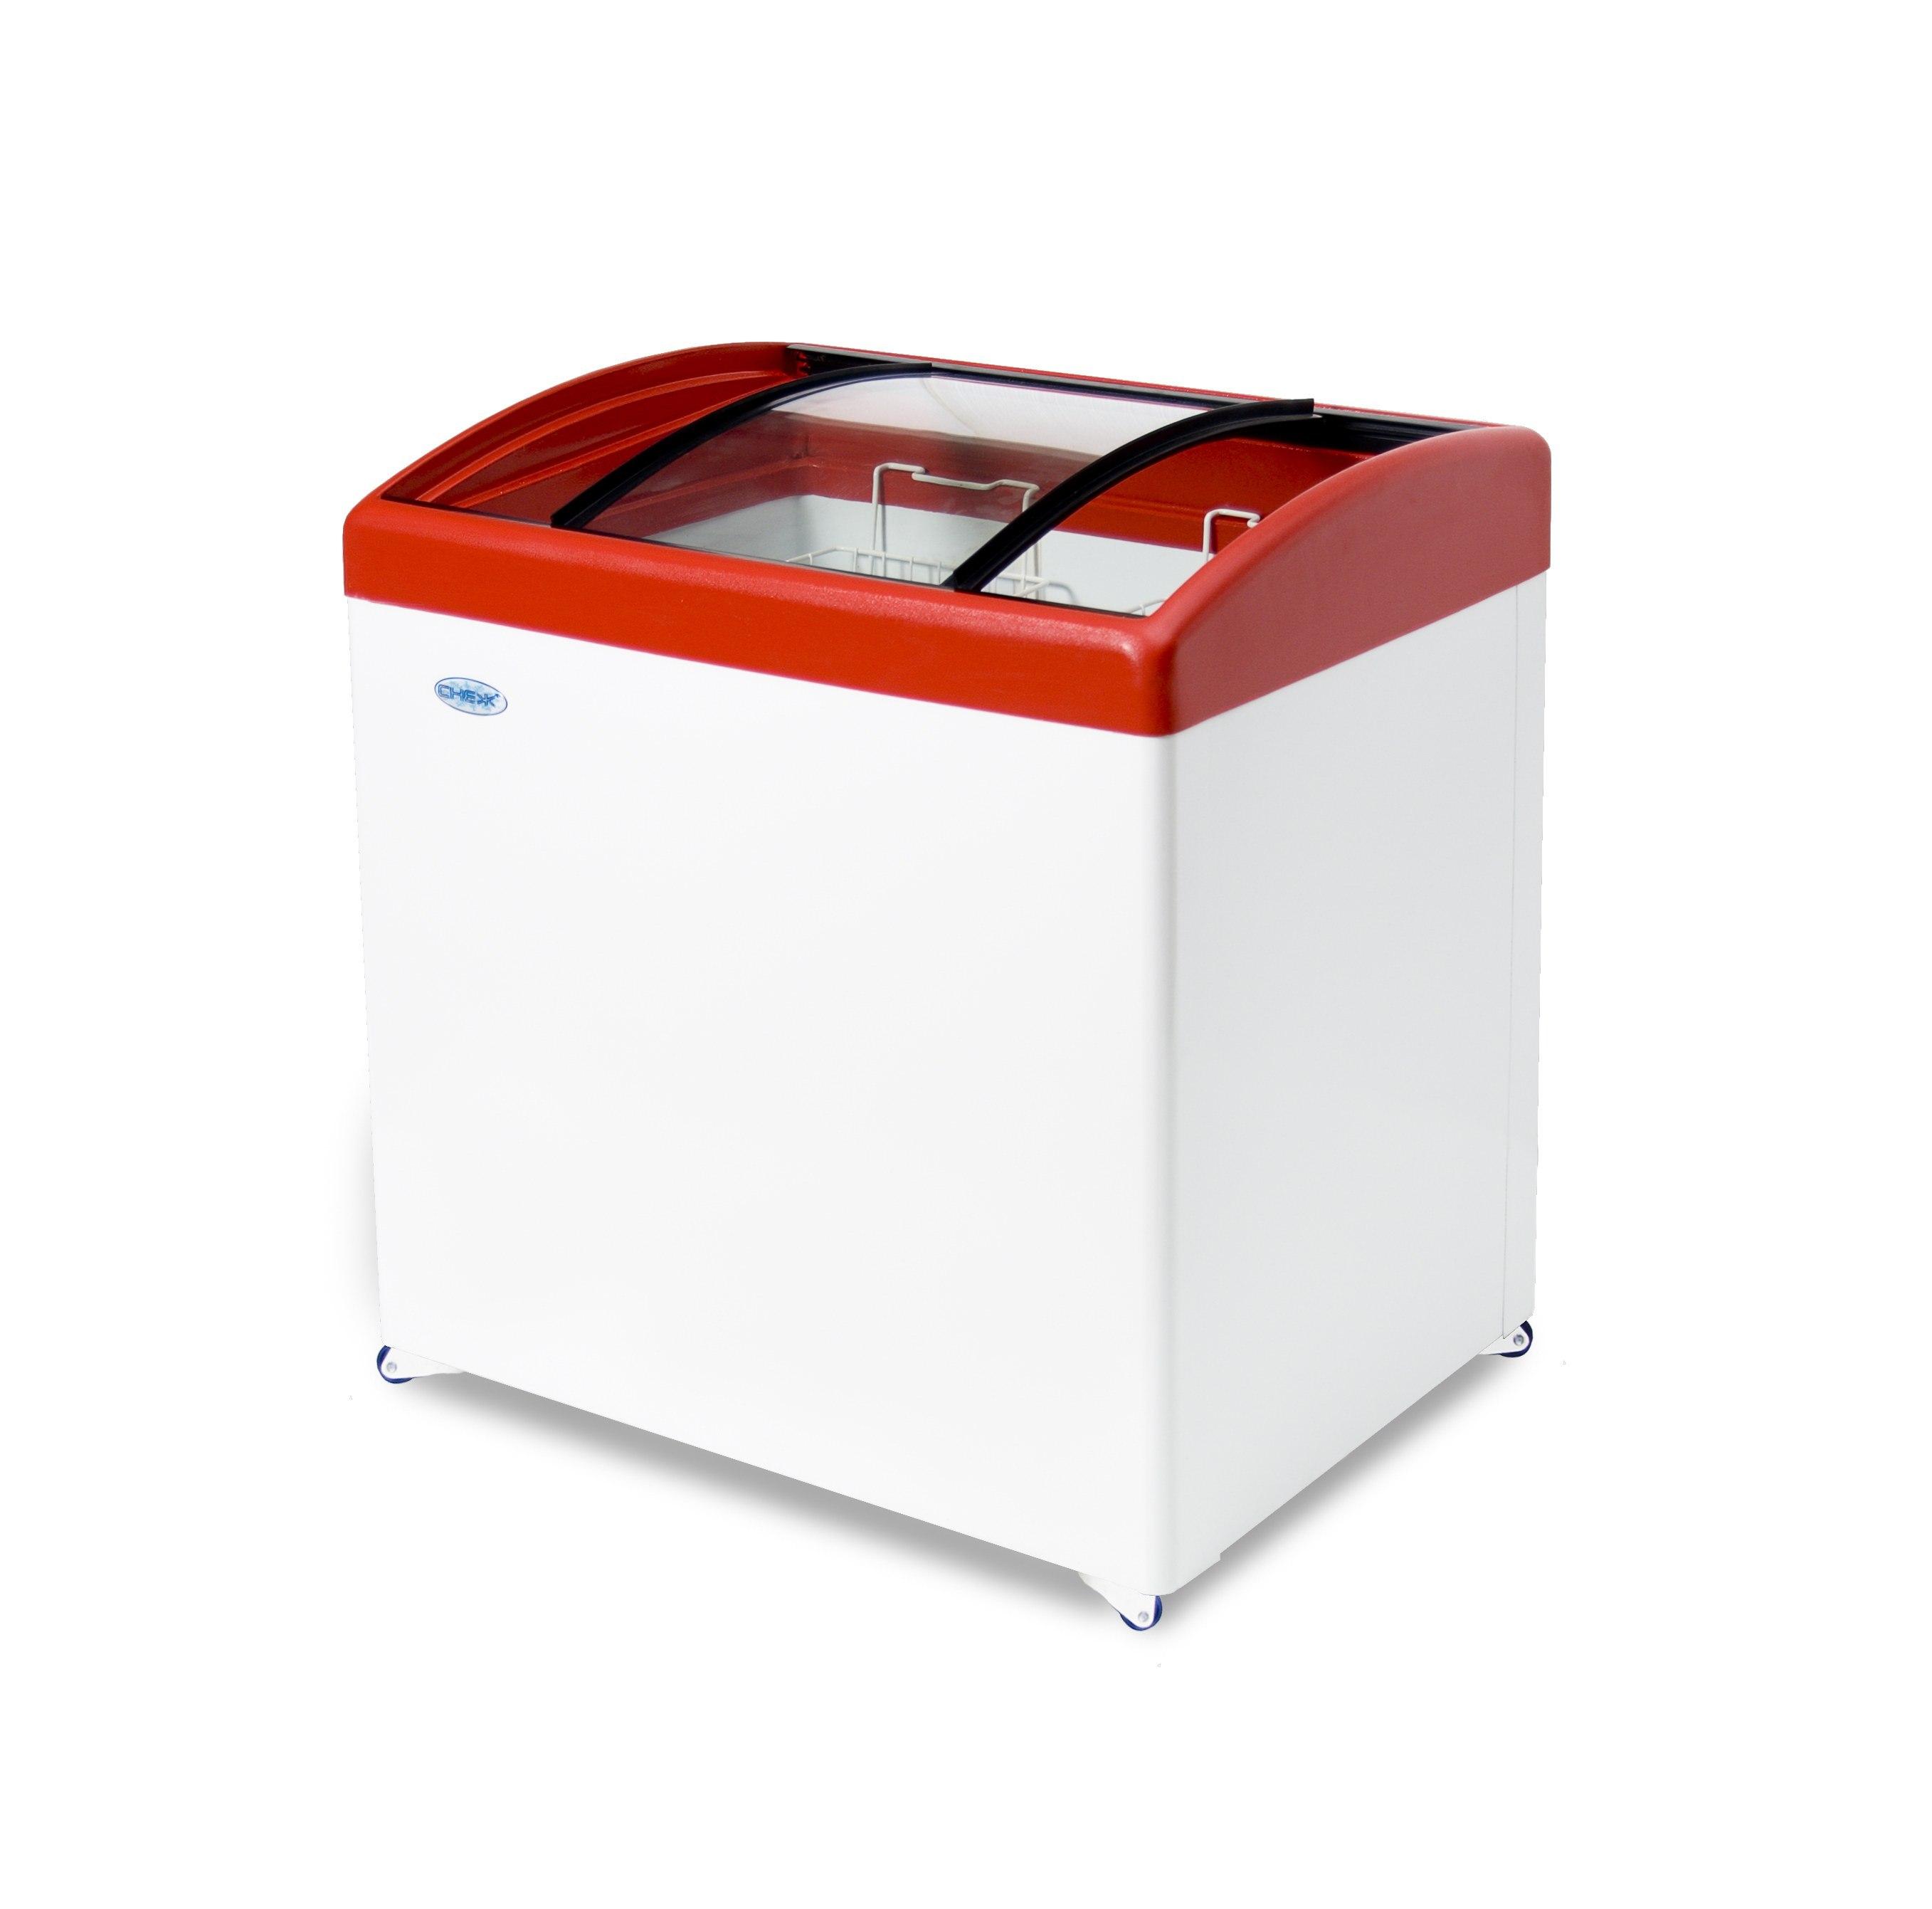 Морозильный ларь «Снеж» МЛГ 250